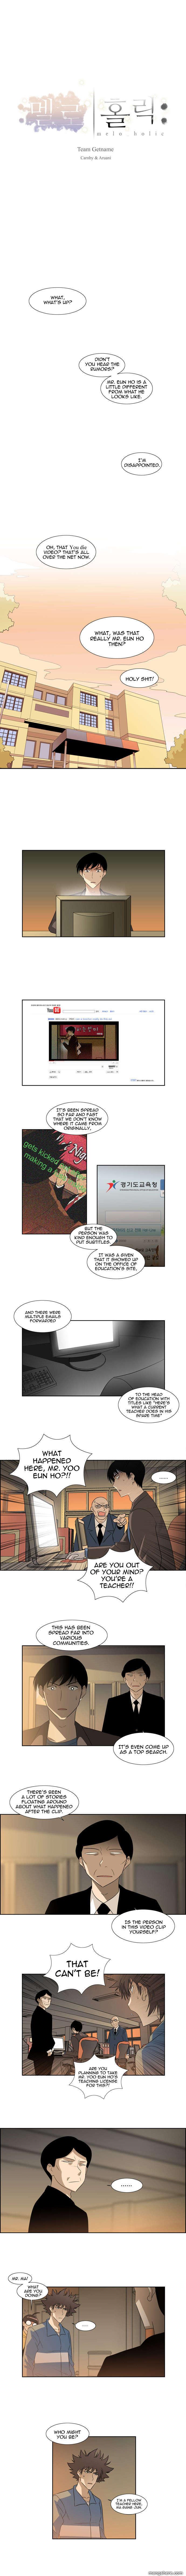 Melo Holic 51 Page 1